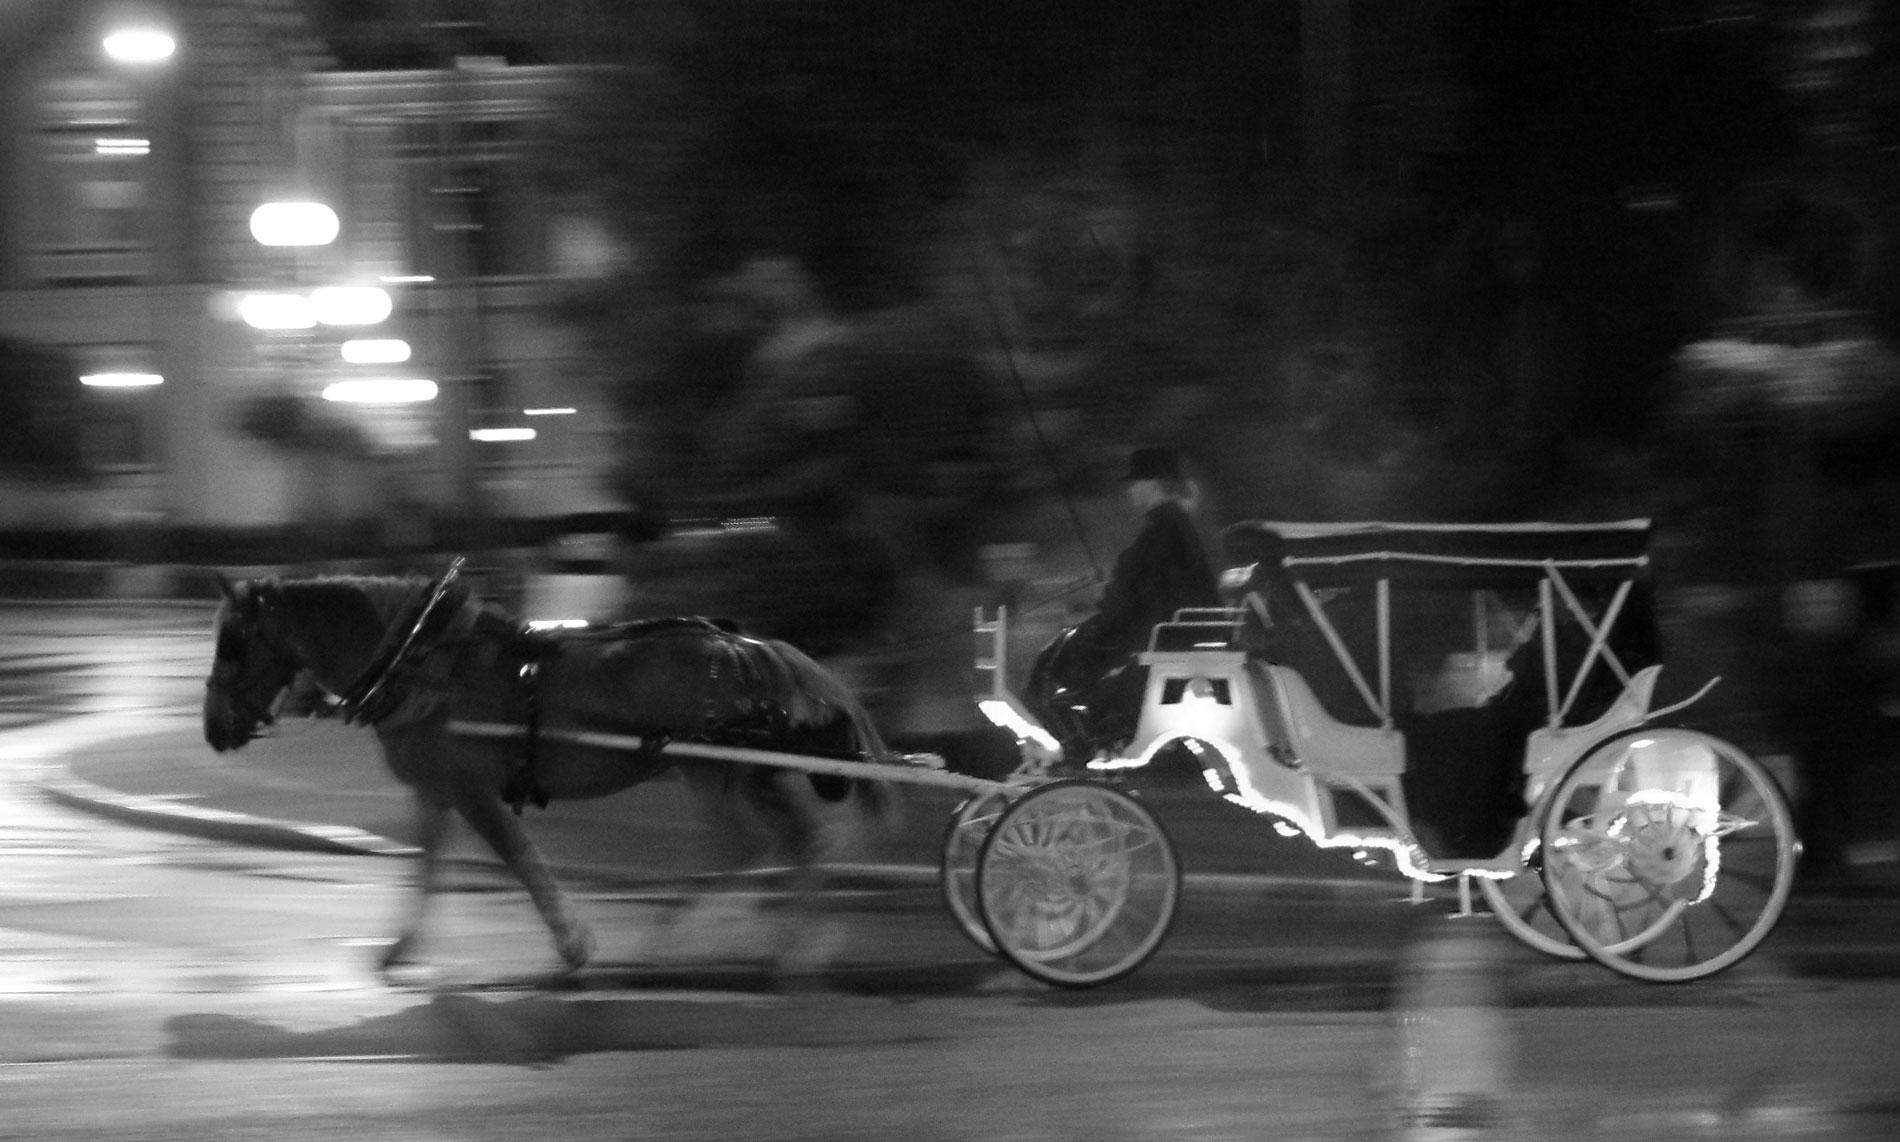 Carriage ©2018 Adam Graser Photography